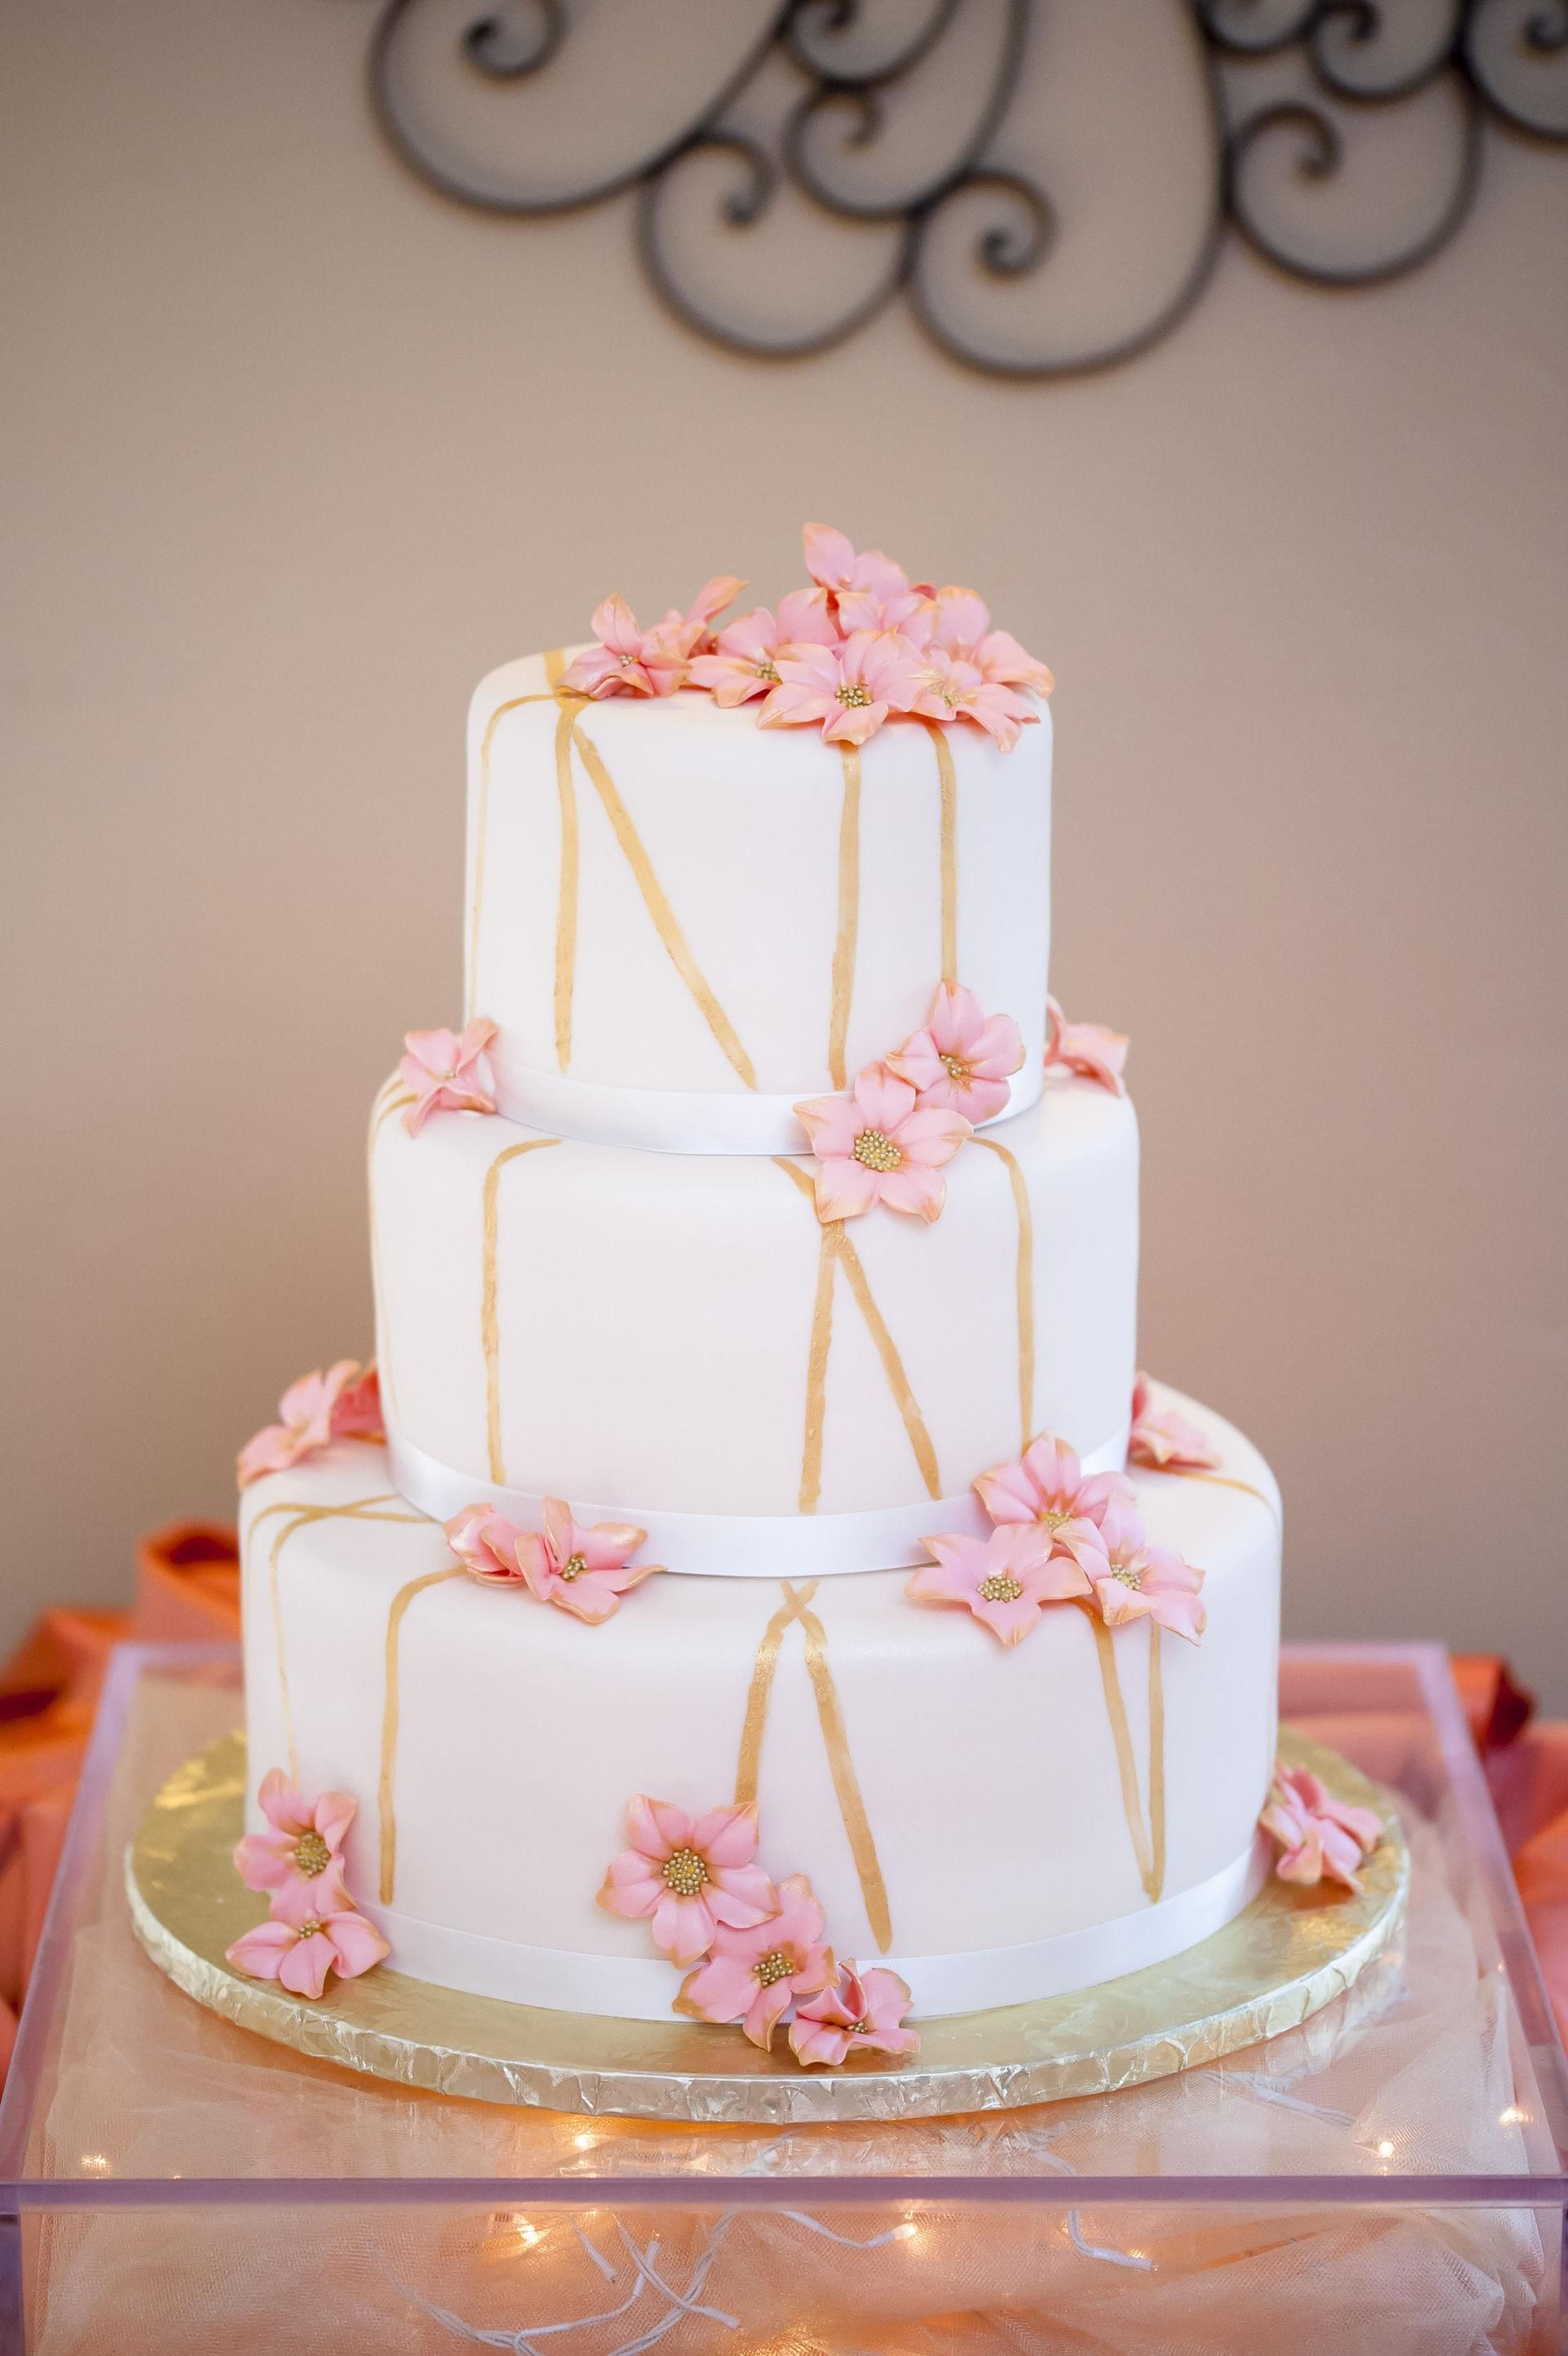 The Smarter Way To Wed Pinterest Wedding Cake Pink Wedding Cake